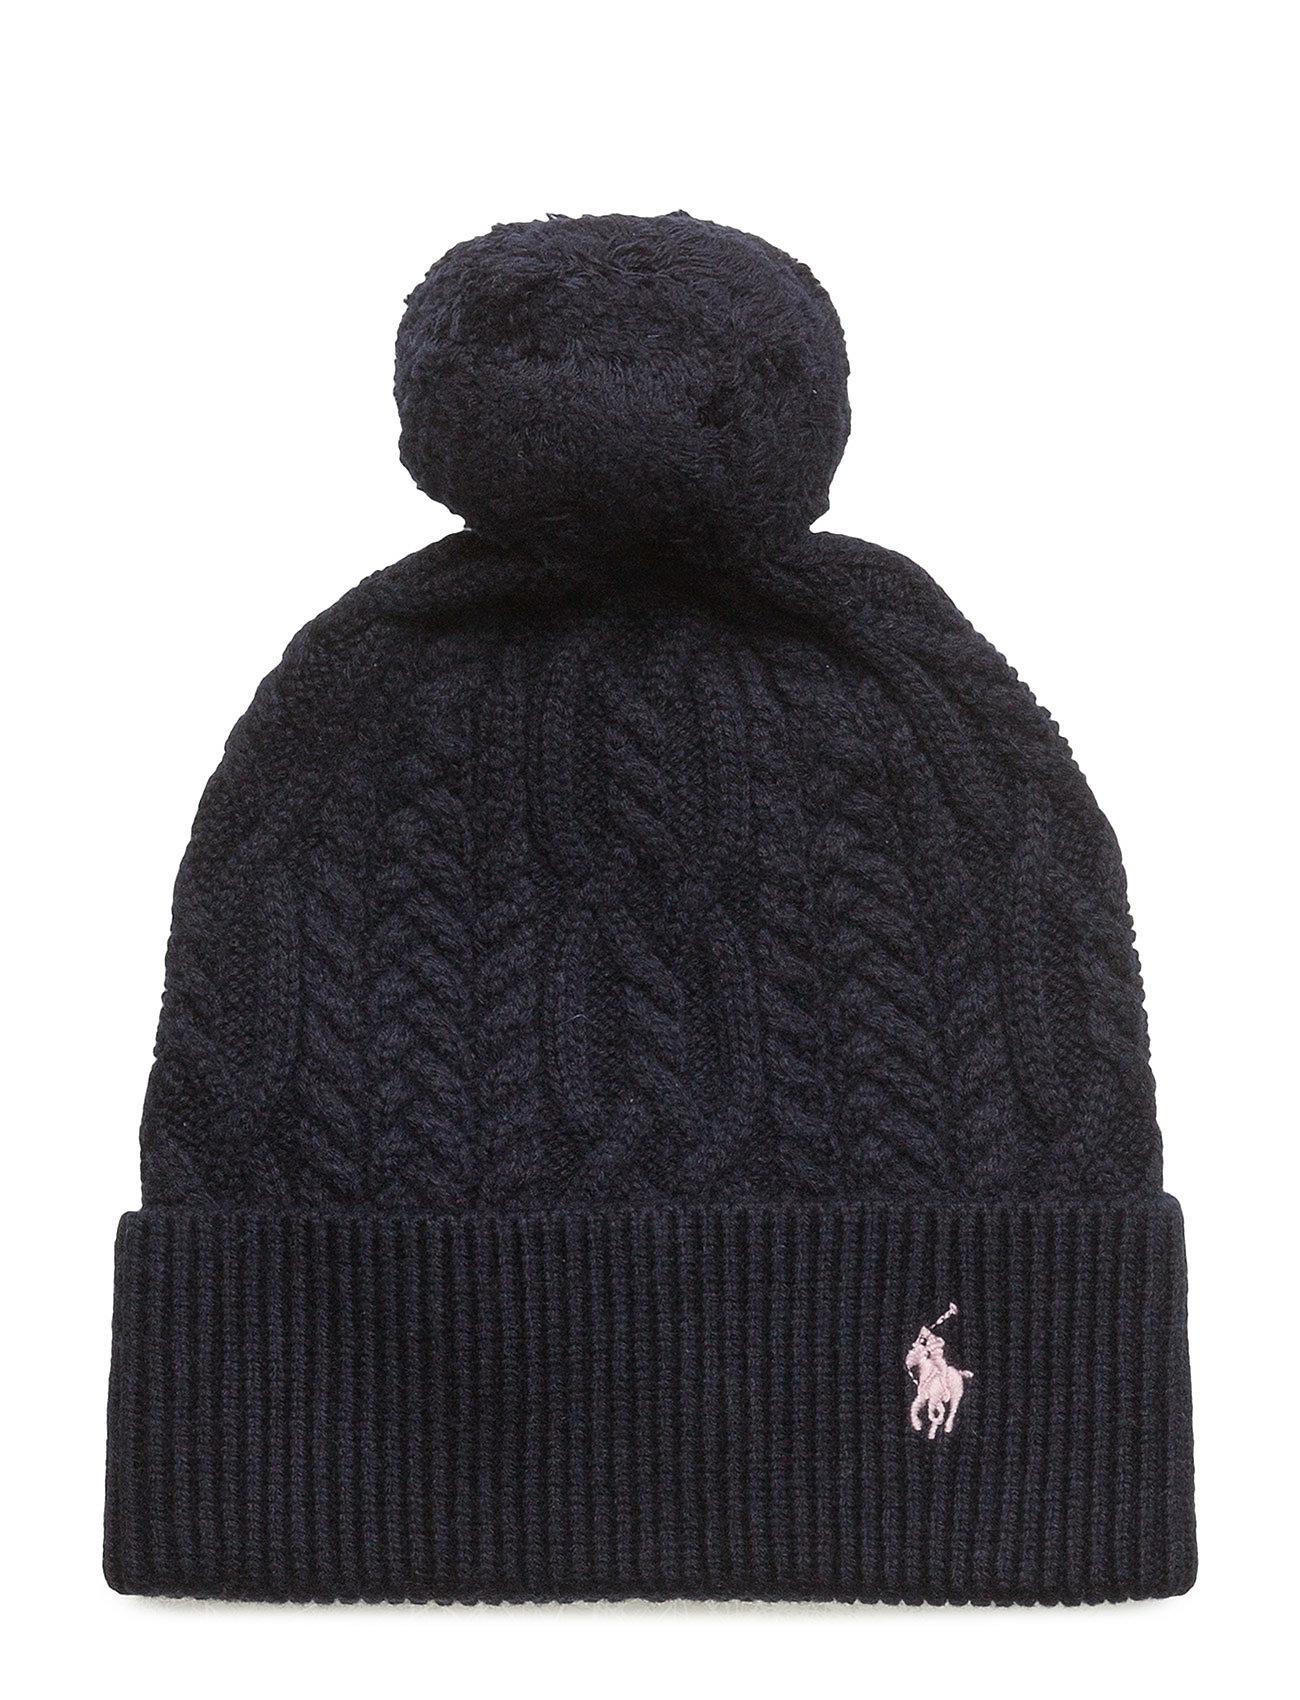 d31bbcdfaaa Aran-knit Pom-pom Hat (Hunter Navy) (£29.40) - Ralph Lauren Kids ...